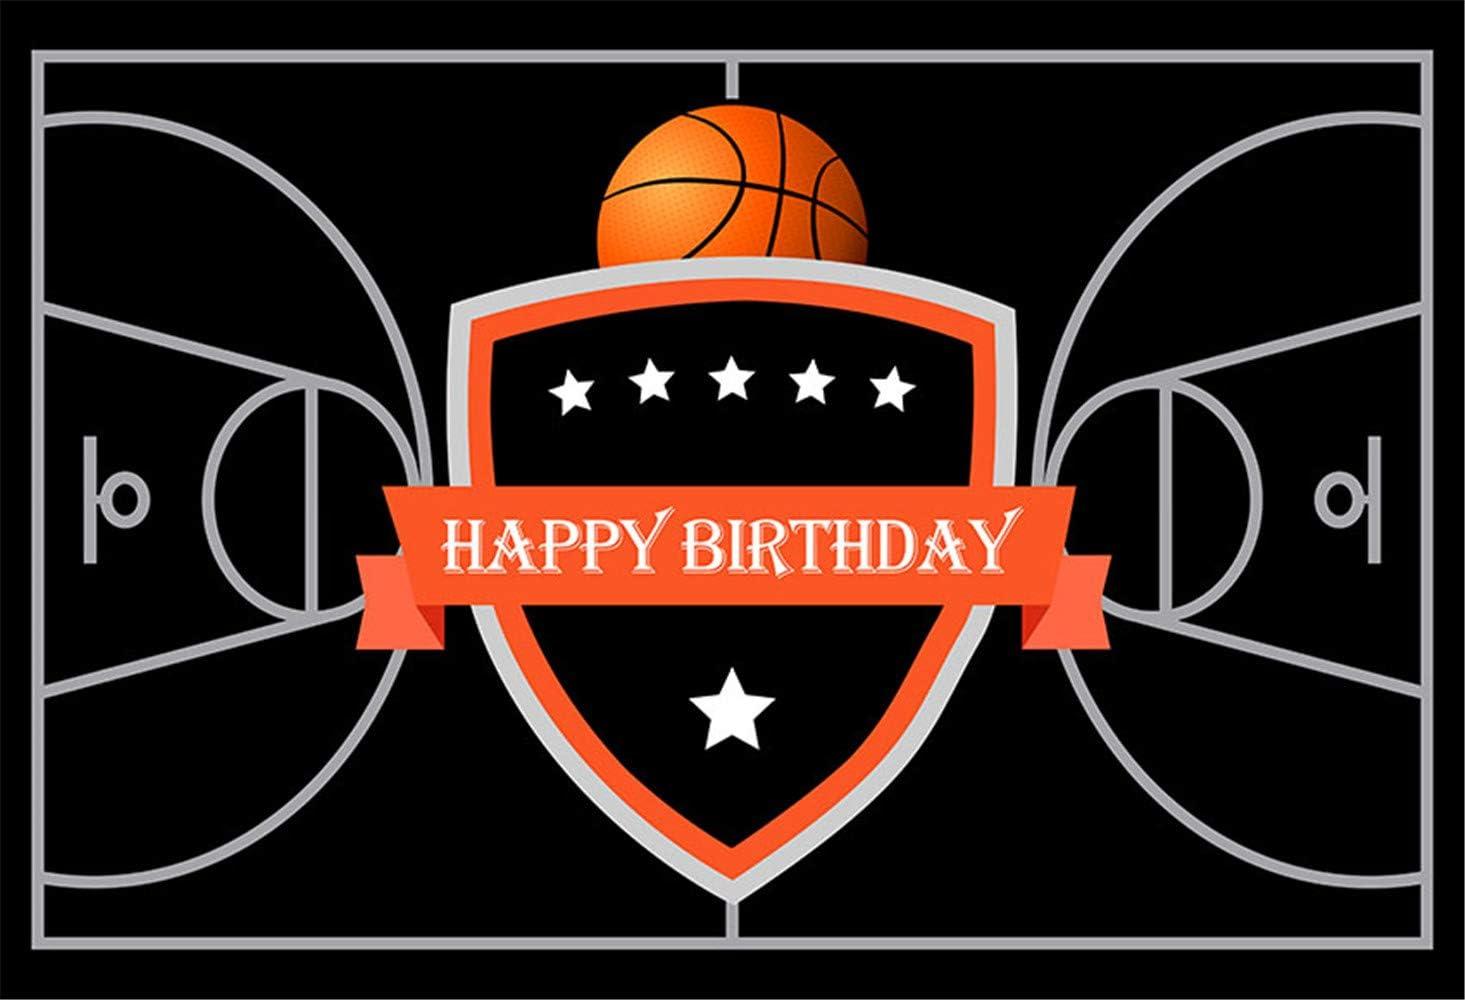 Amazon Com 7x5 Black Basketball Backdrops For Photography Custom Basketball Court Floor Photo Background For Boy Birthday Parties Basketabll Season Banner Camera Photo